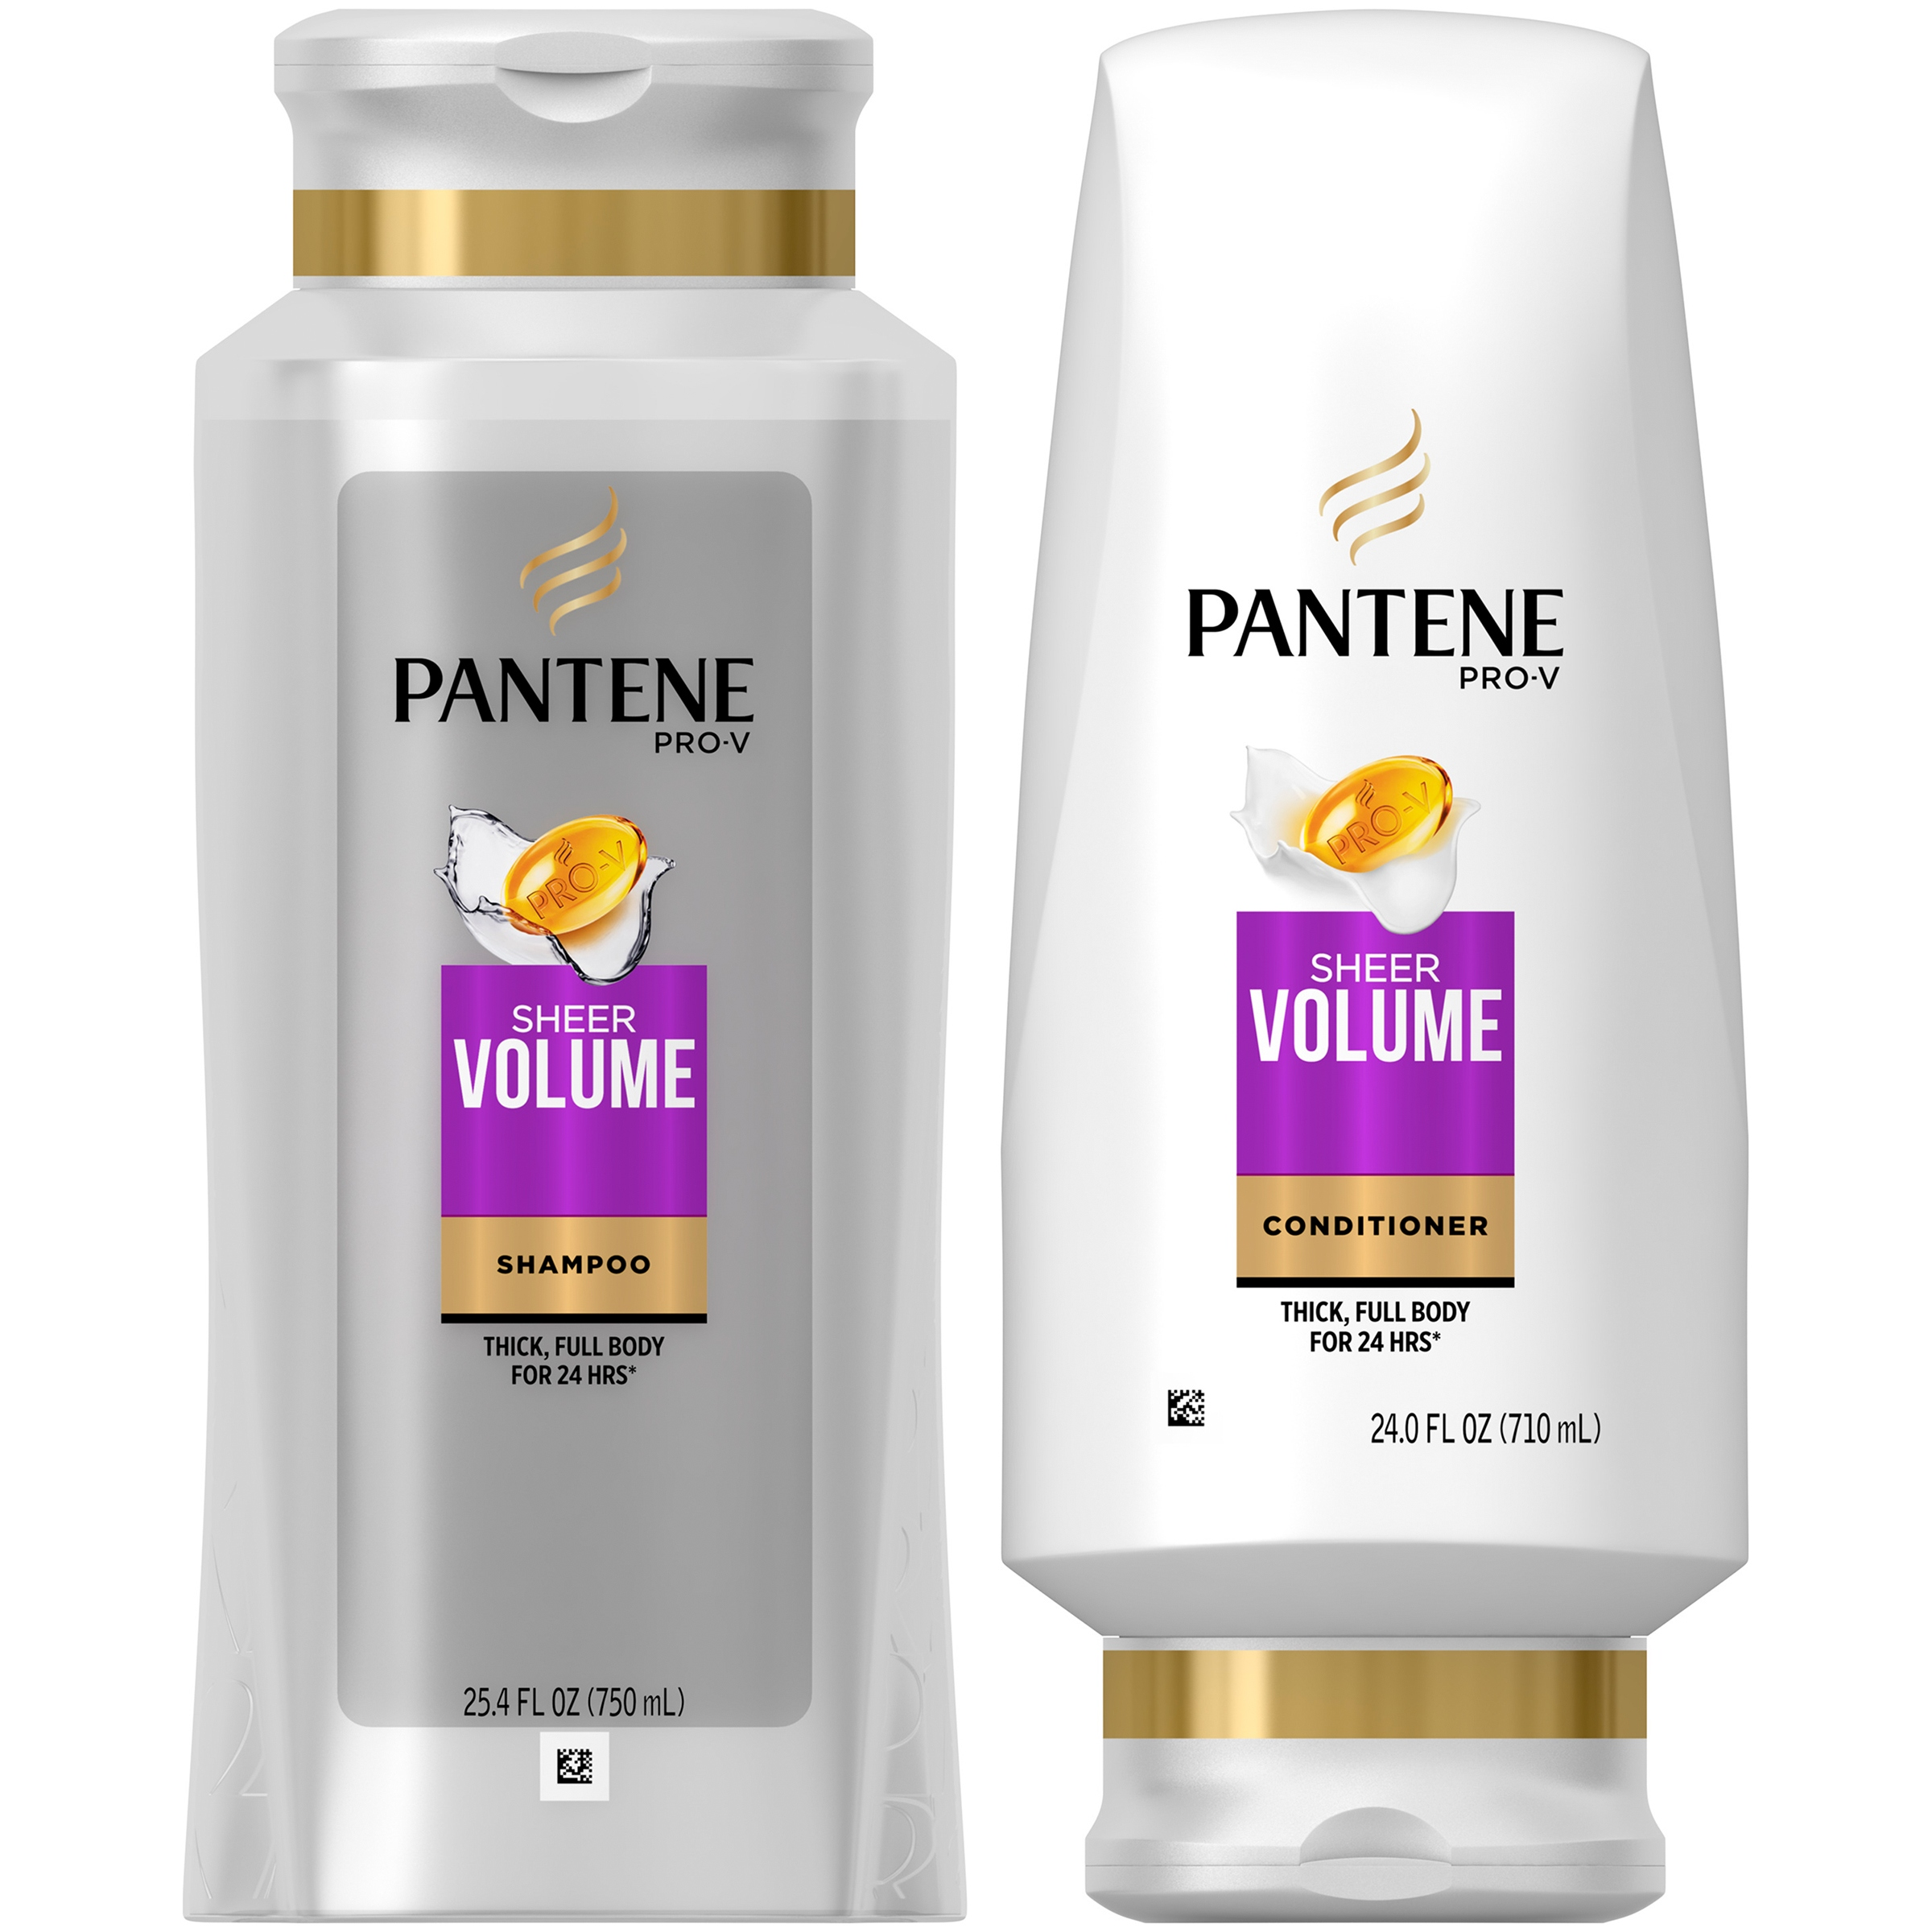 Pantene Pro-V Sheer Volume Shampoo and Conditioner Dual Pack, 49.4 fl oz